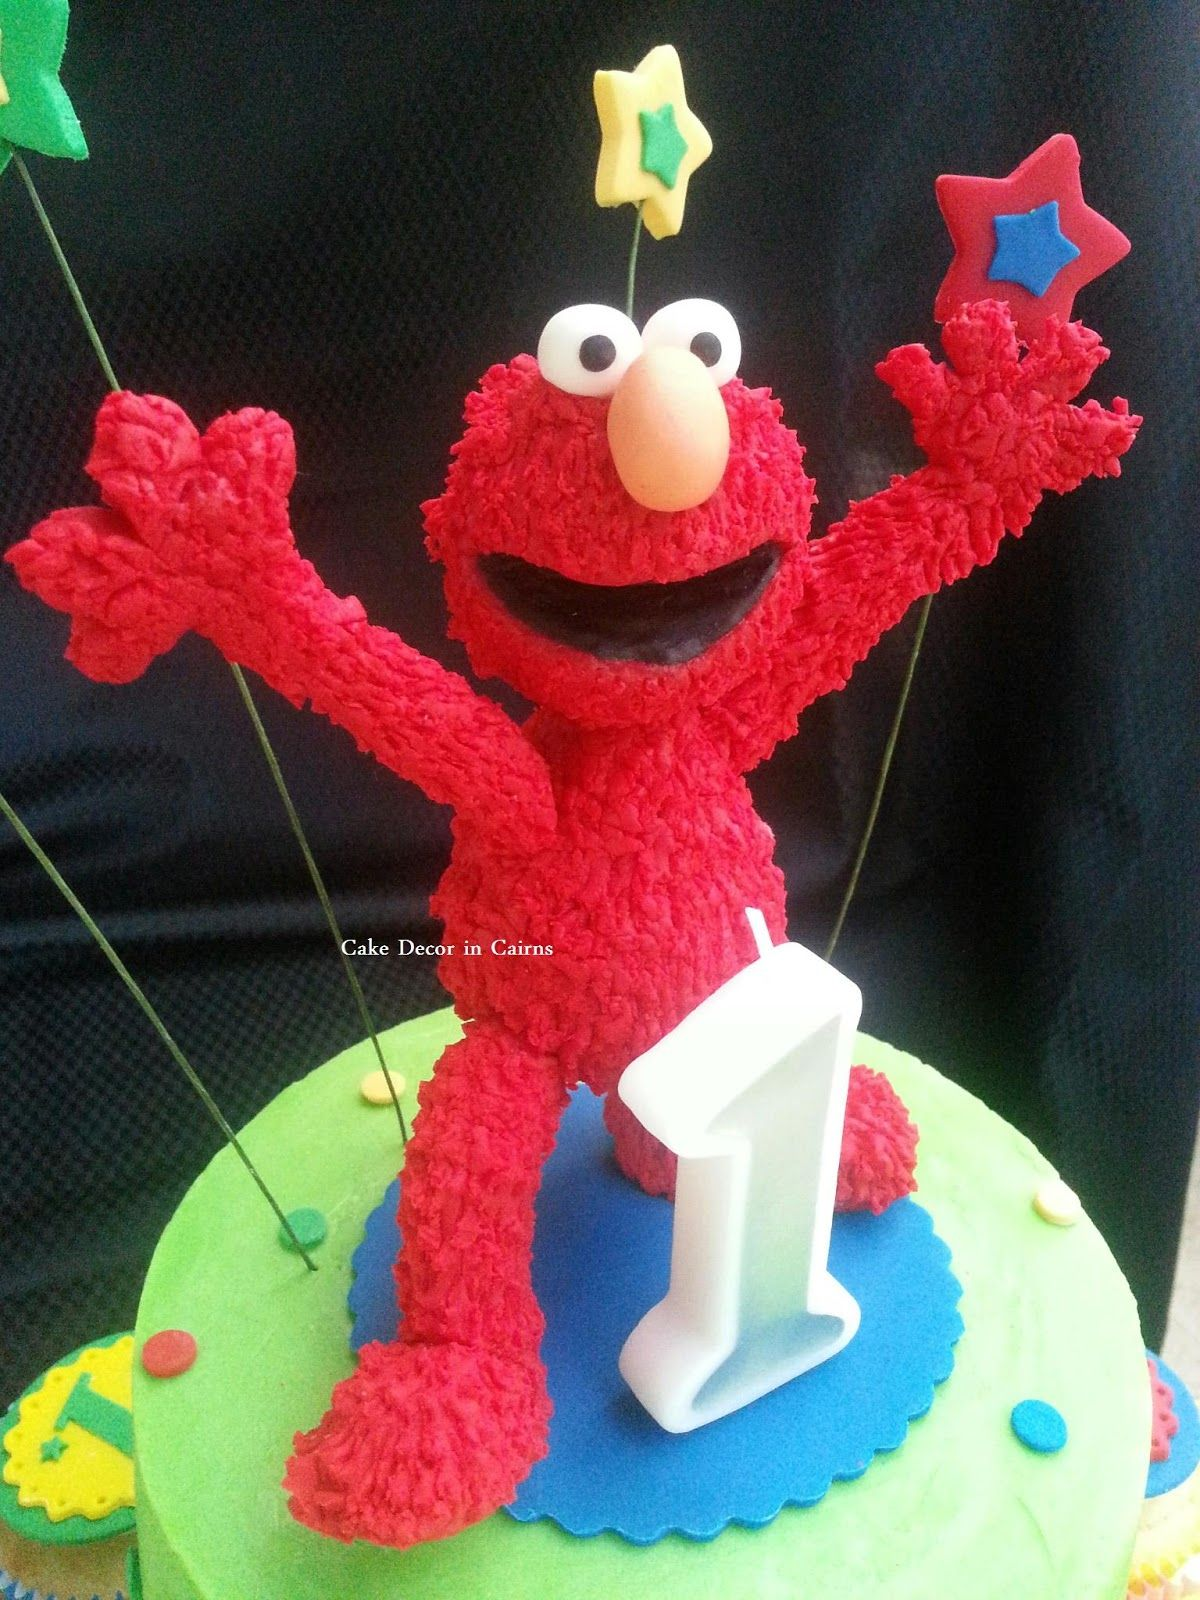 How I made My Fondant Elmo Cake Topper mini photo tutorial